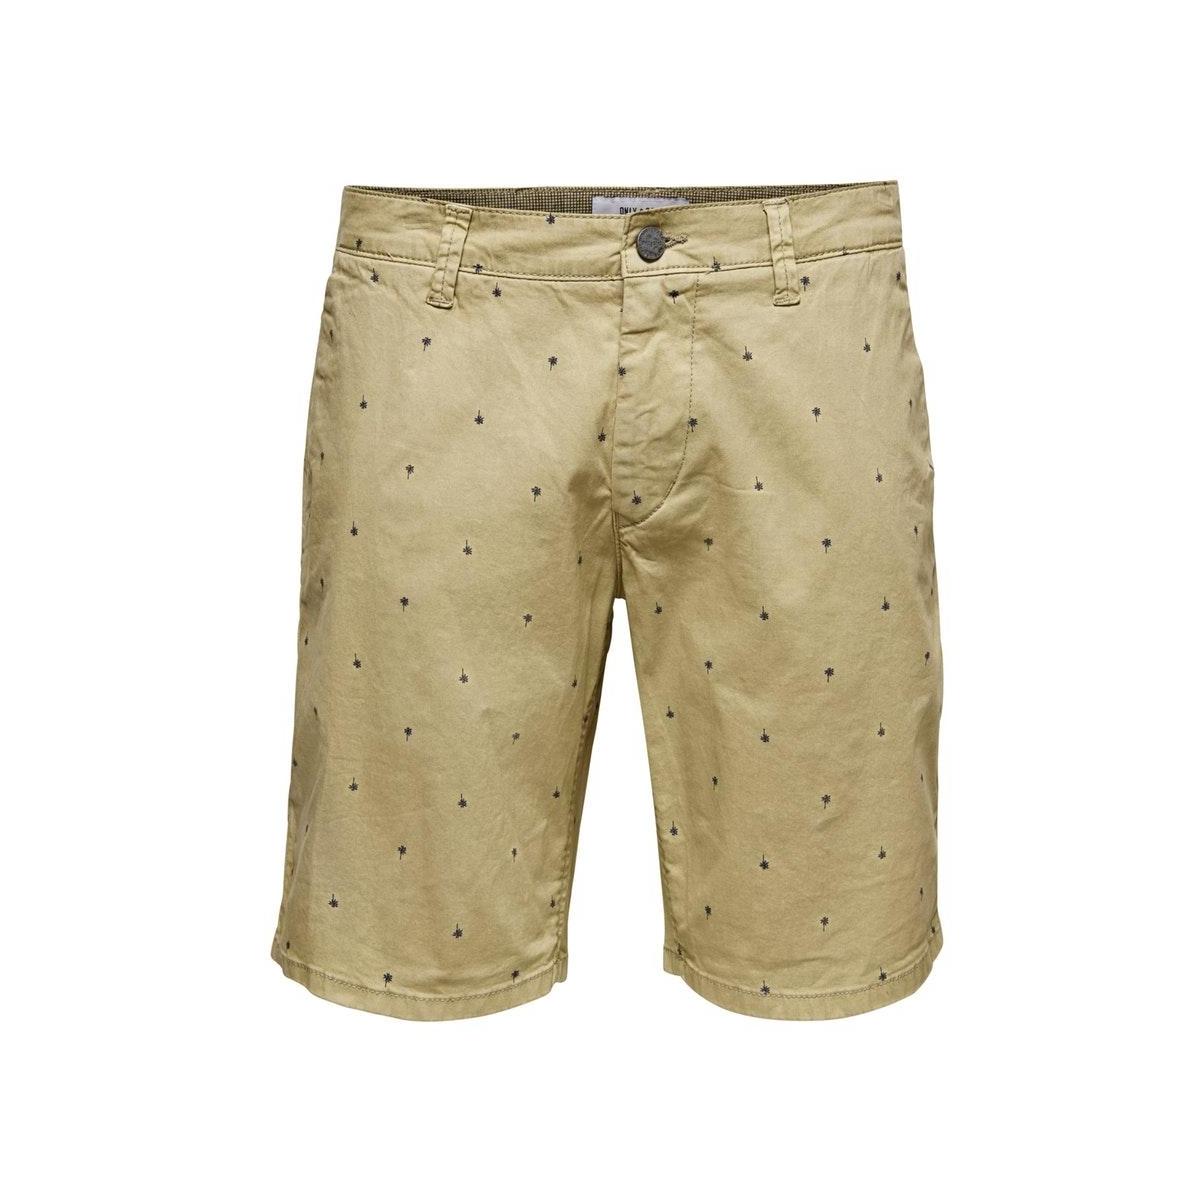 onsholm chino shorts aop pk 6081 22016081 only & sons korte broek chinchilla